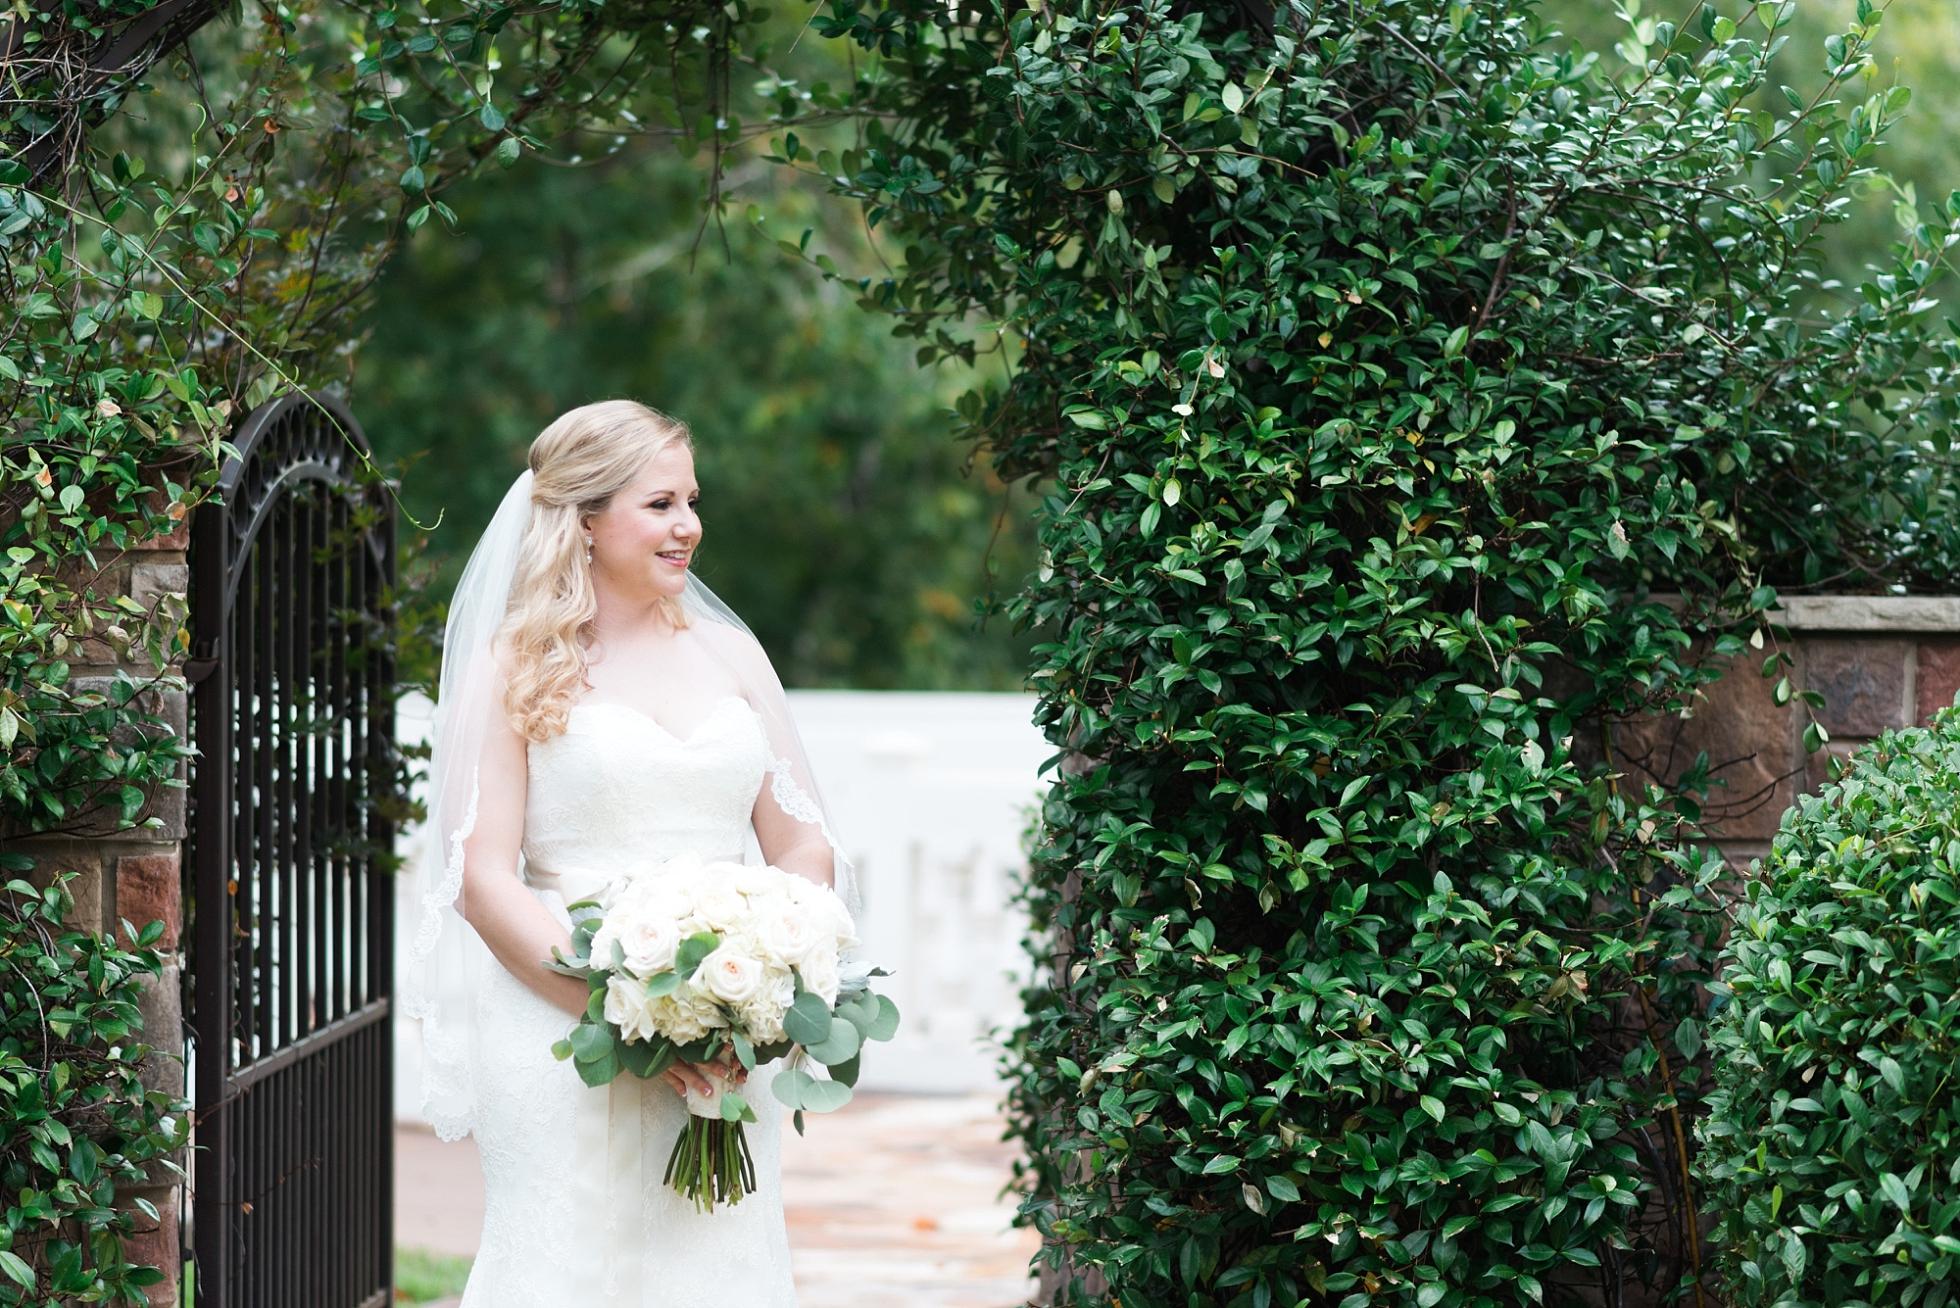 Bridal Portraits | Kyle & Erin | Scarbrough Wedding | Children's Harbor | Laura Wilkerson Photography